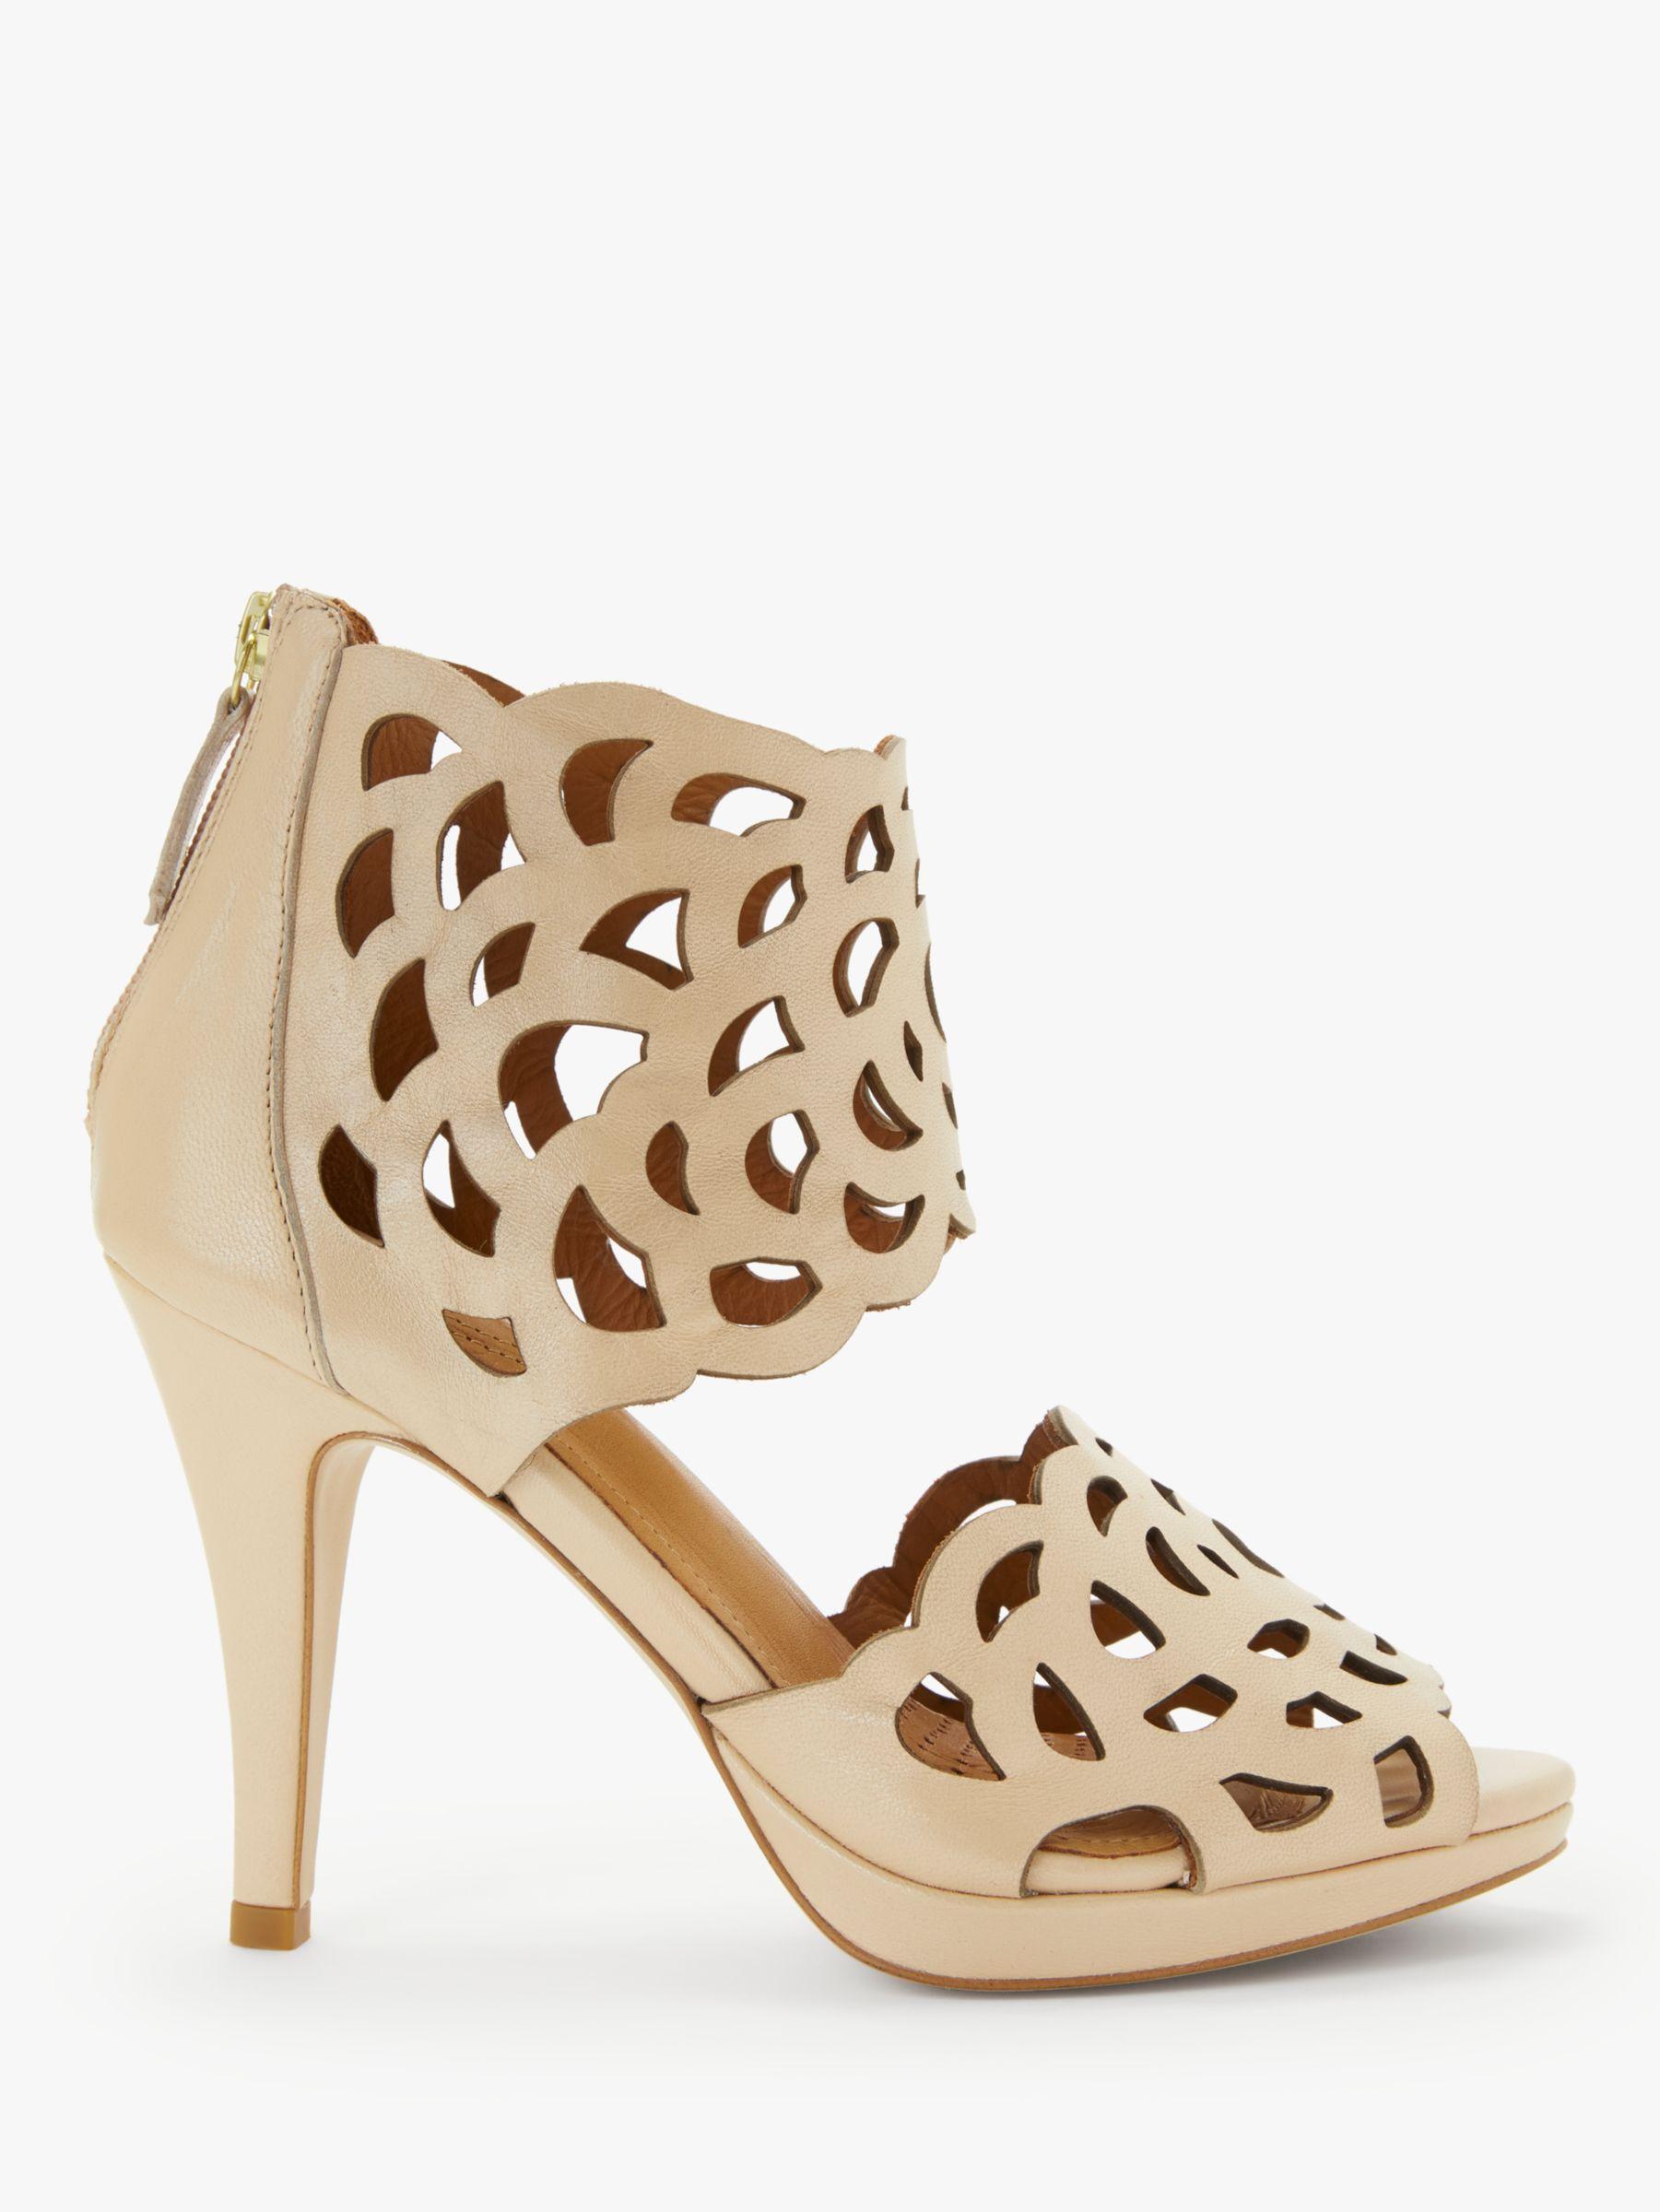 9234196955d04d Sargossa Inspire Heeled Sandals in Natural - Lyst